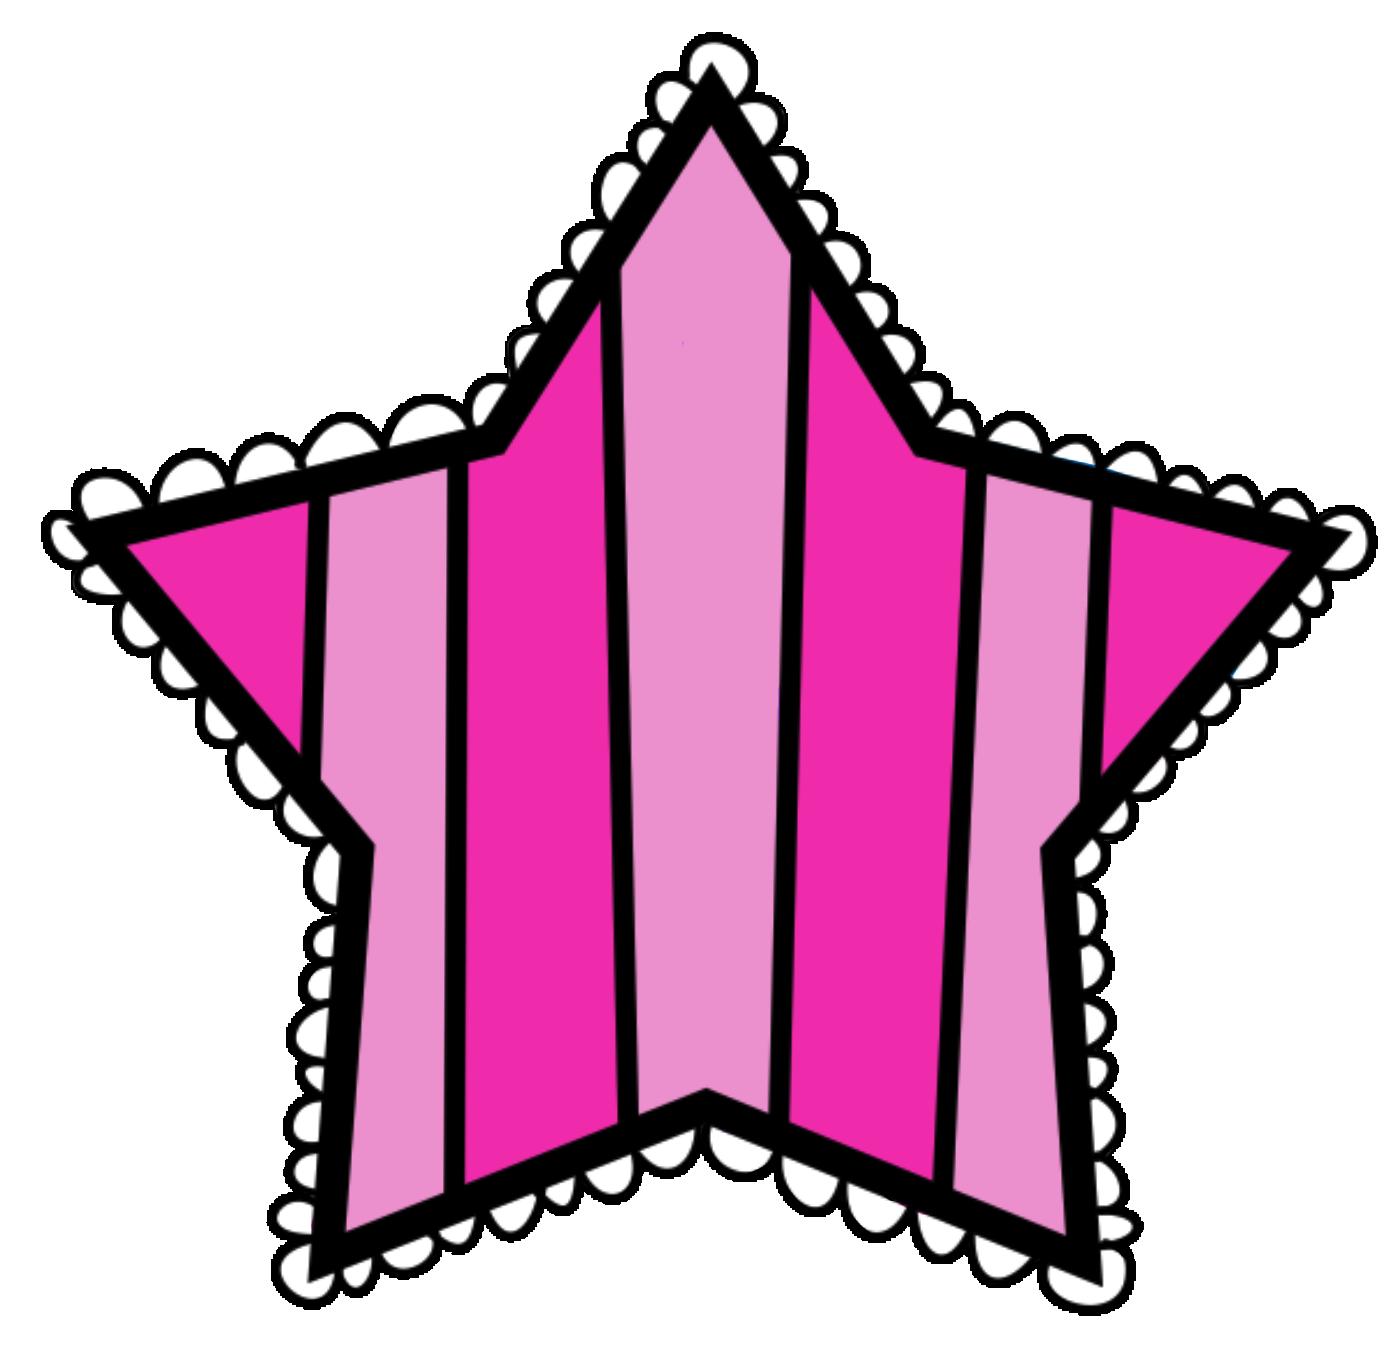 kindergarten clipart star